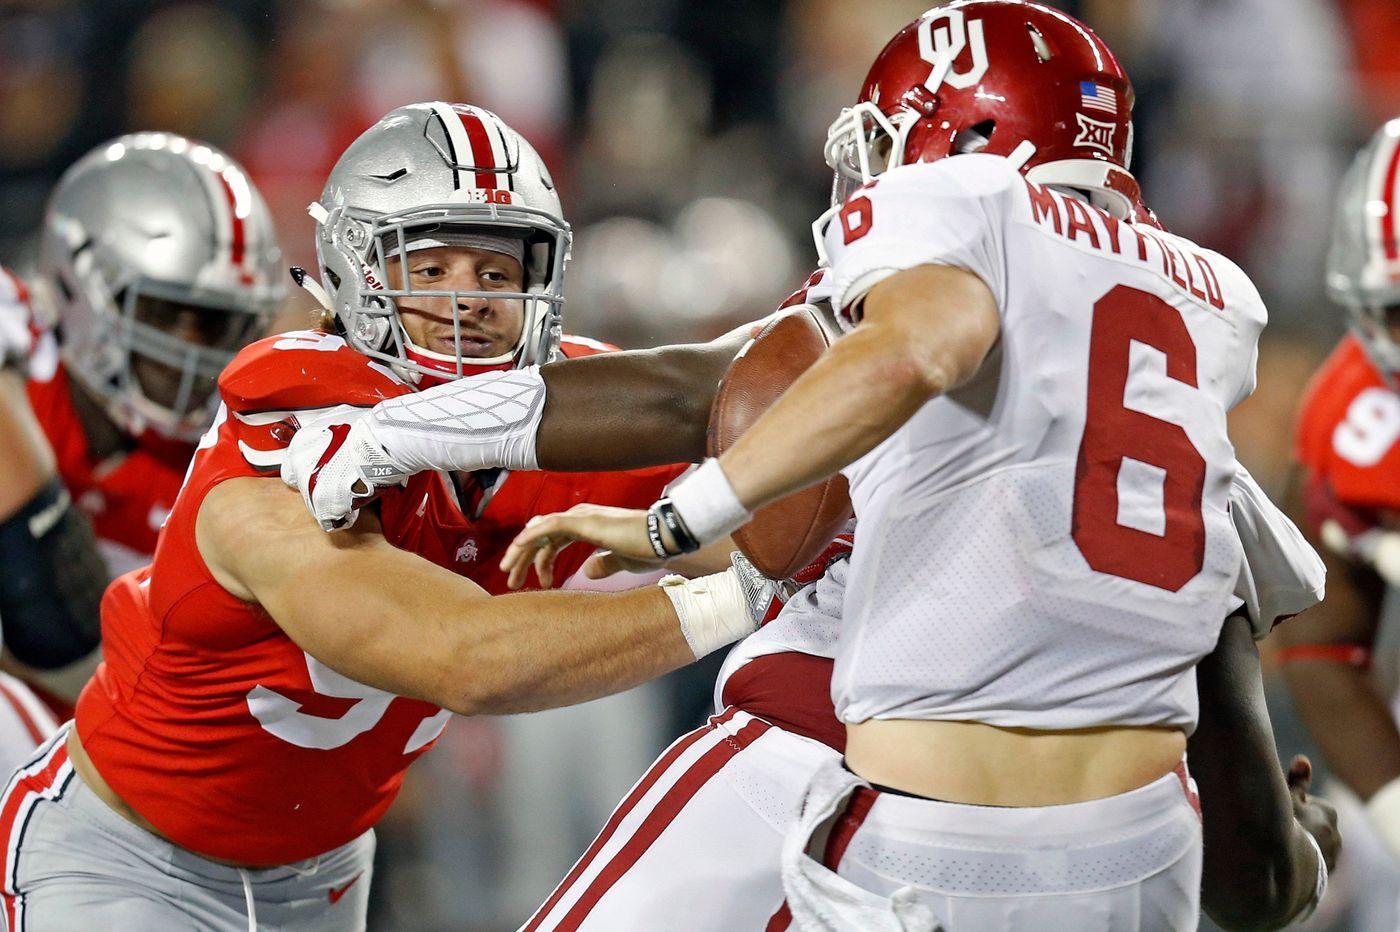 NFL draft: Ben Fennell breaks down the edge rushers